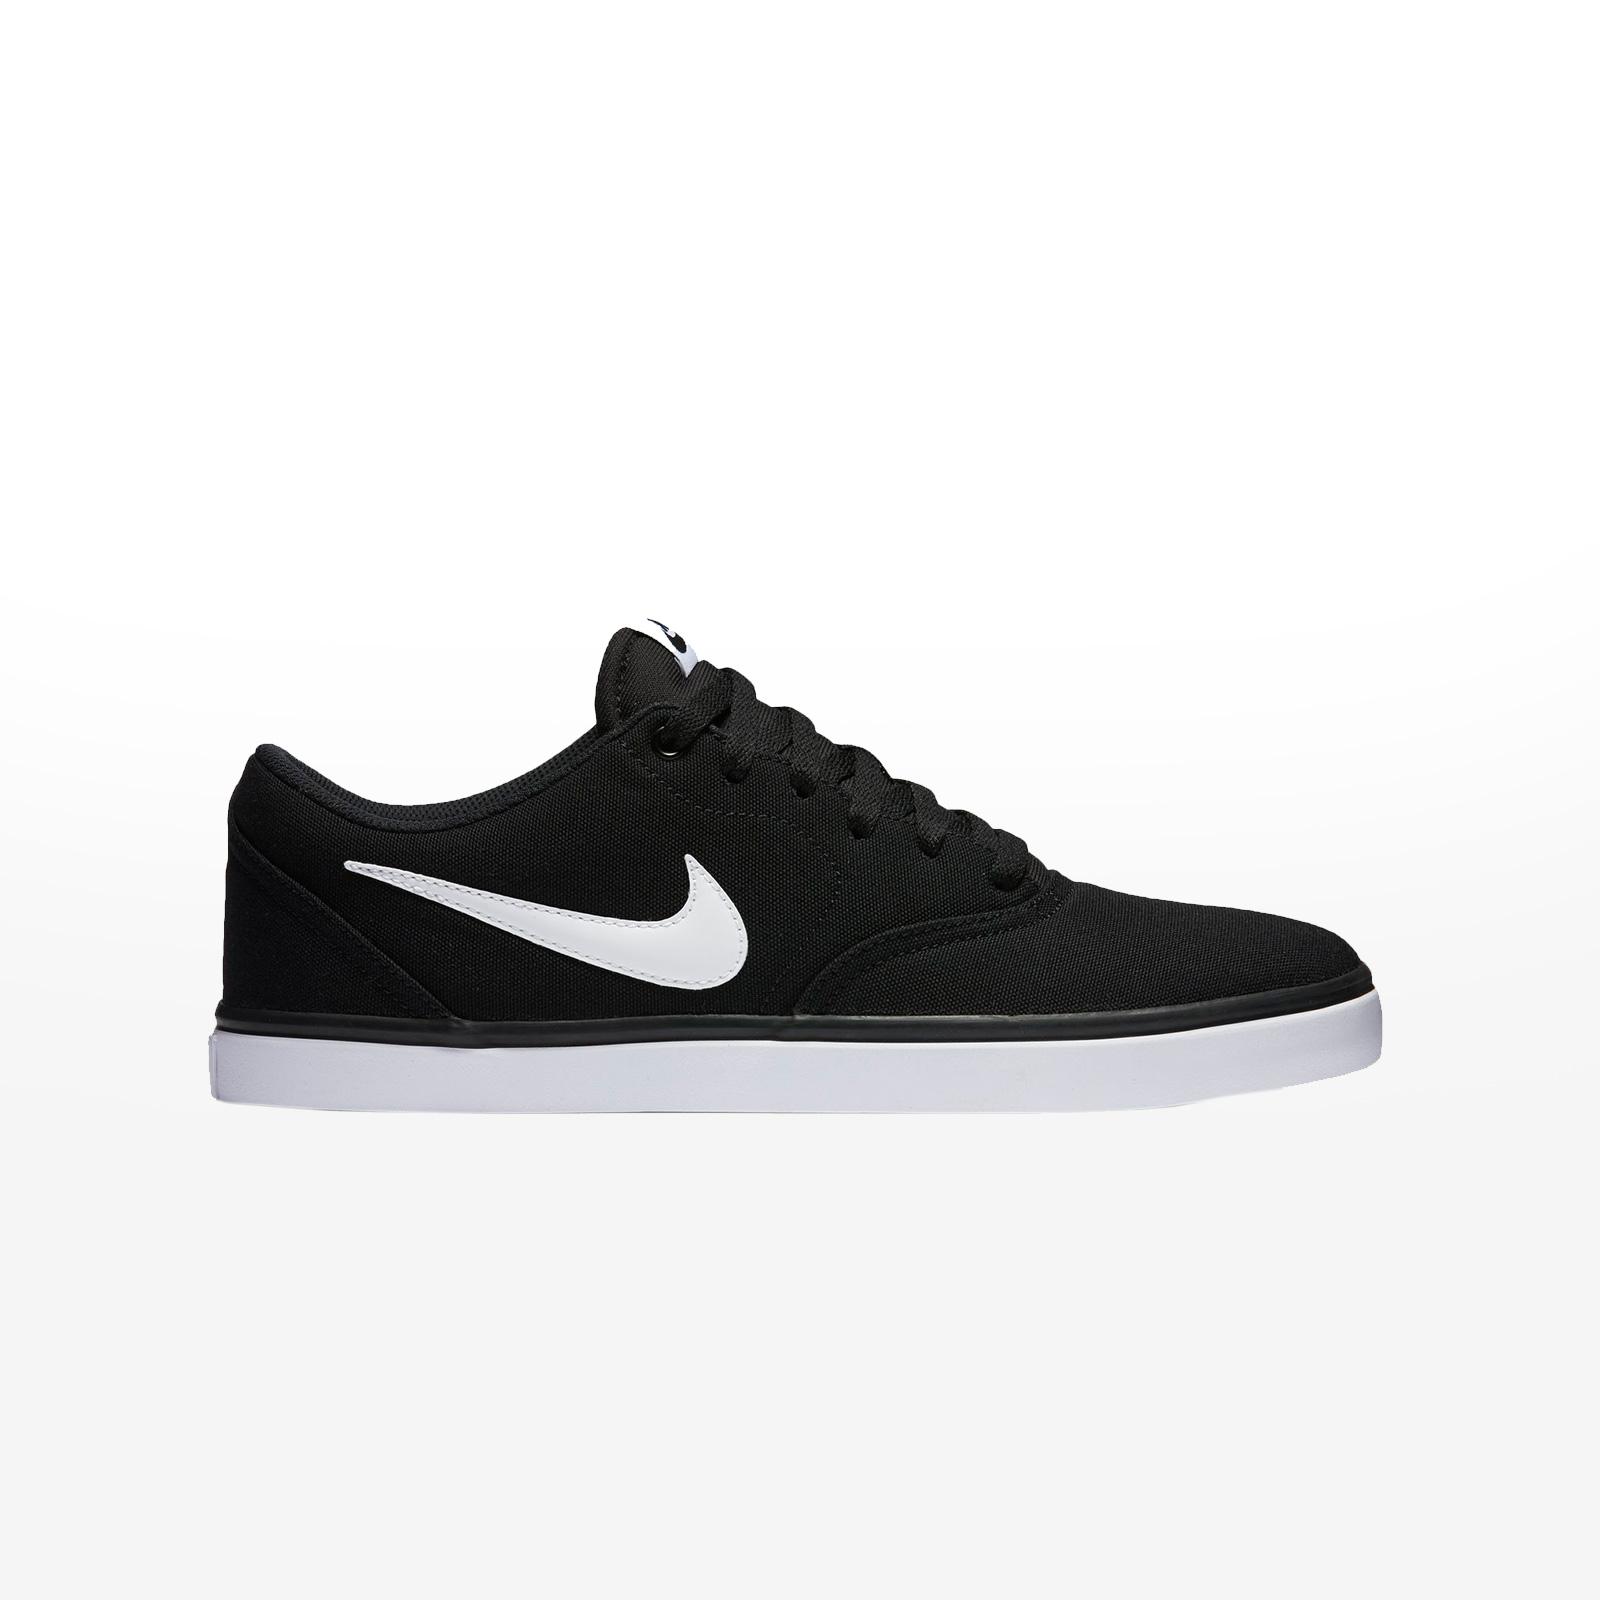 4a3eb1ad73c Sportcafe Nike – NIKE SB CHECK SOLAR CNVS – BLACK/WHITE